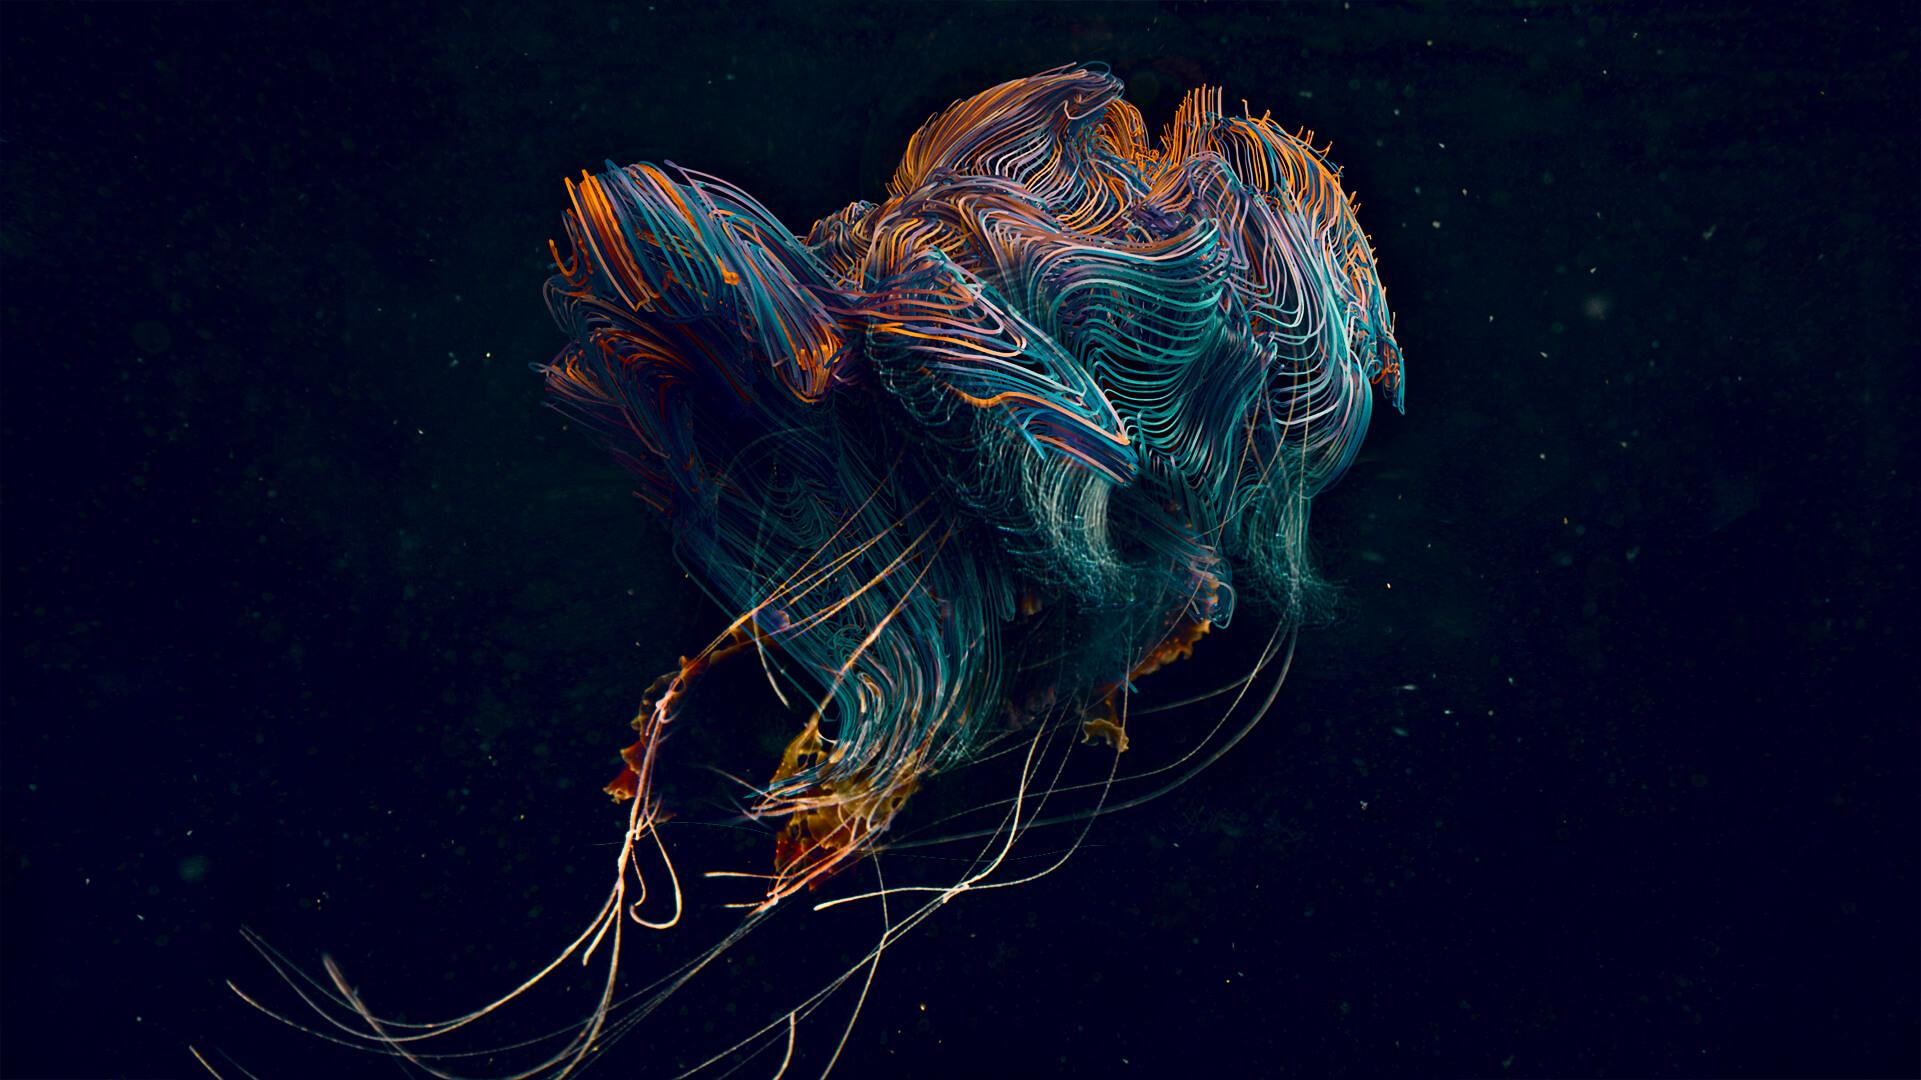 Jellyfish_004